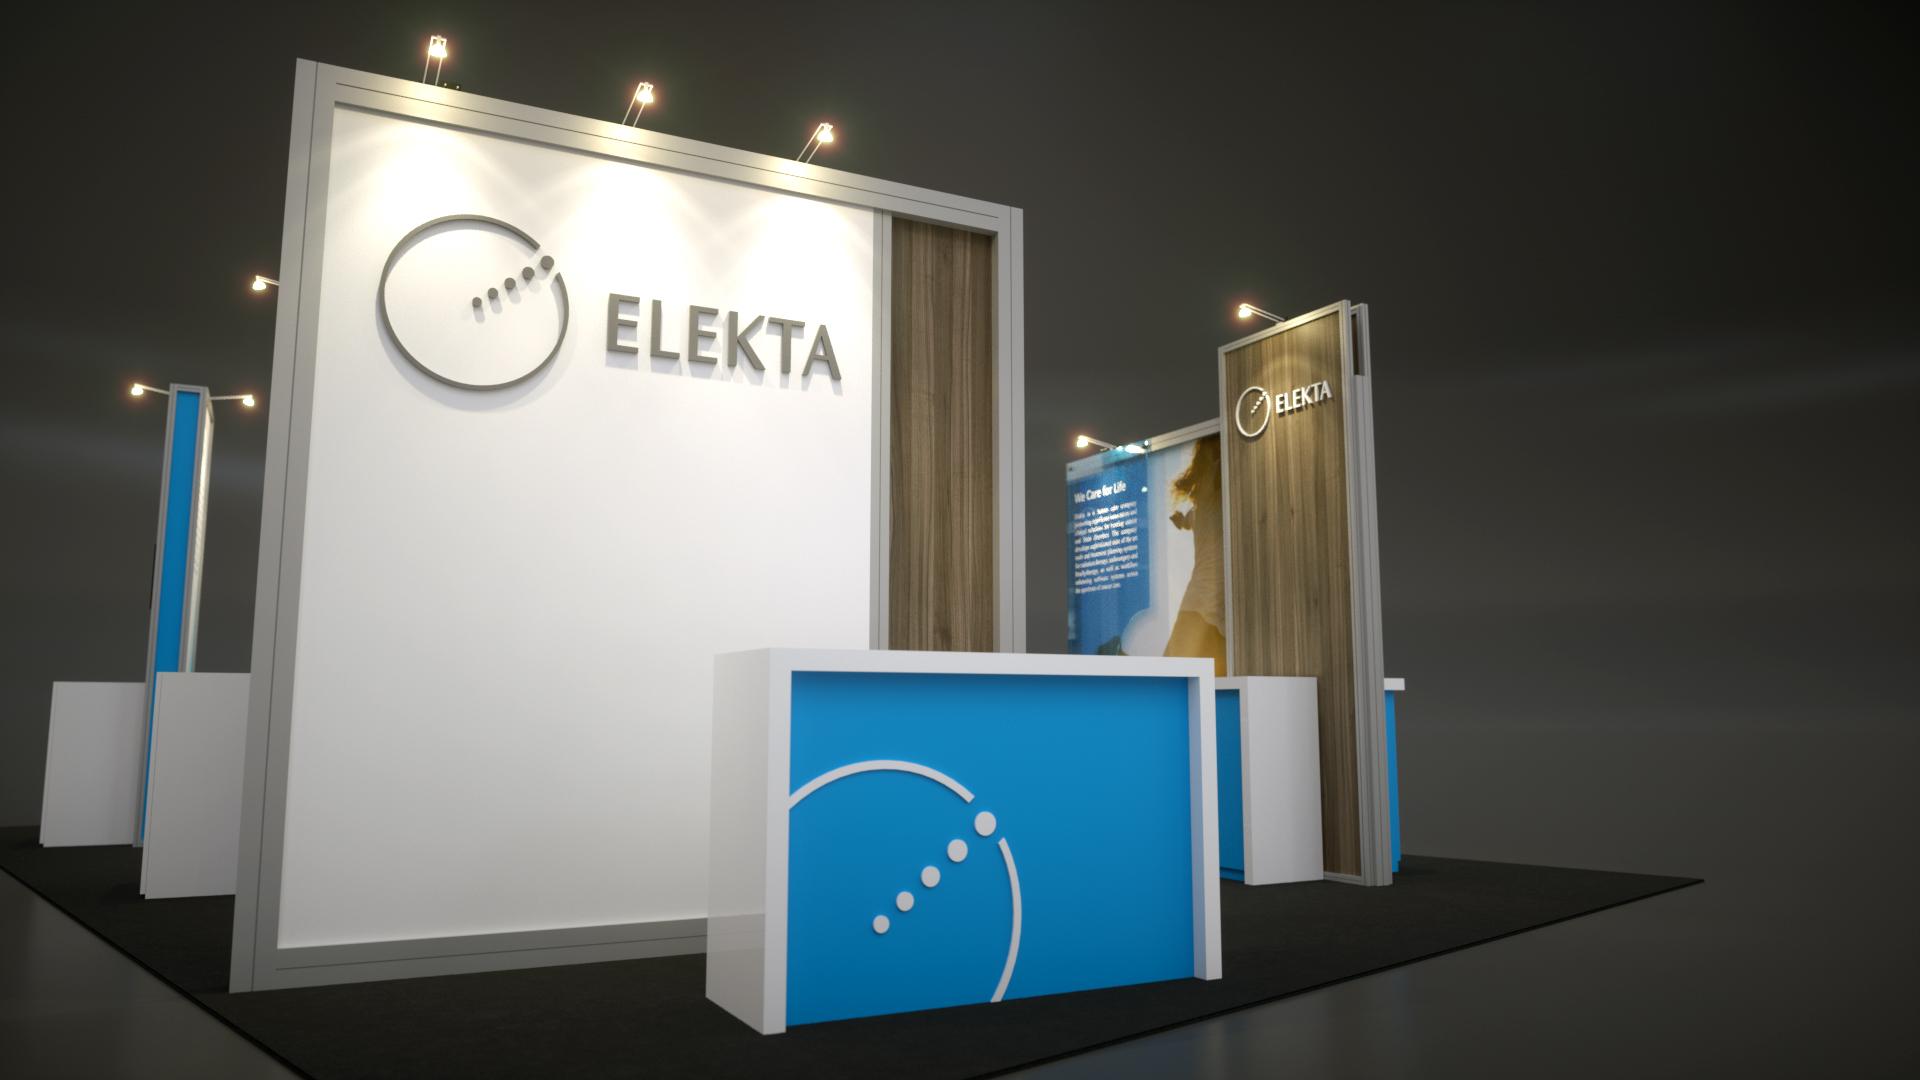 2909 - Czarnowski - Elekta - IUPESM 2015 - View 2.jpg